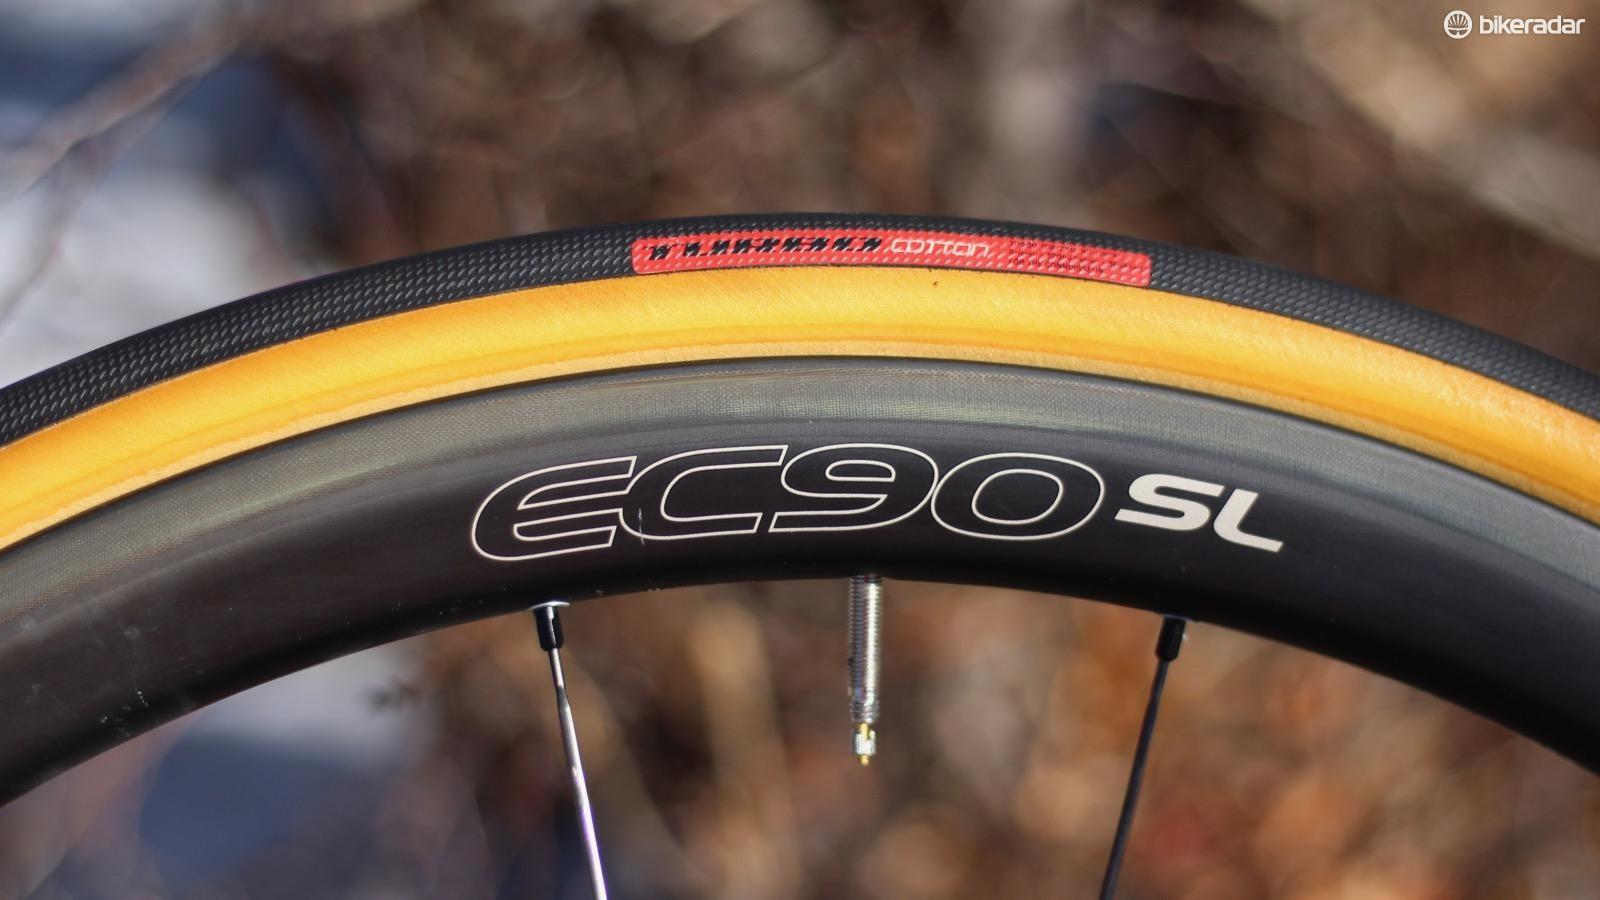 road-tire-test-9-1486070698674-12v11qos1j5gy-896813f